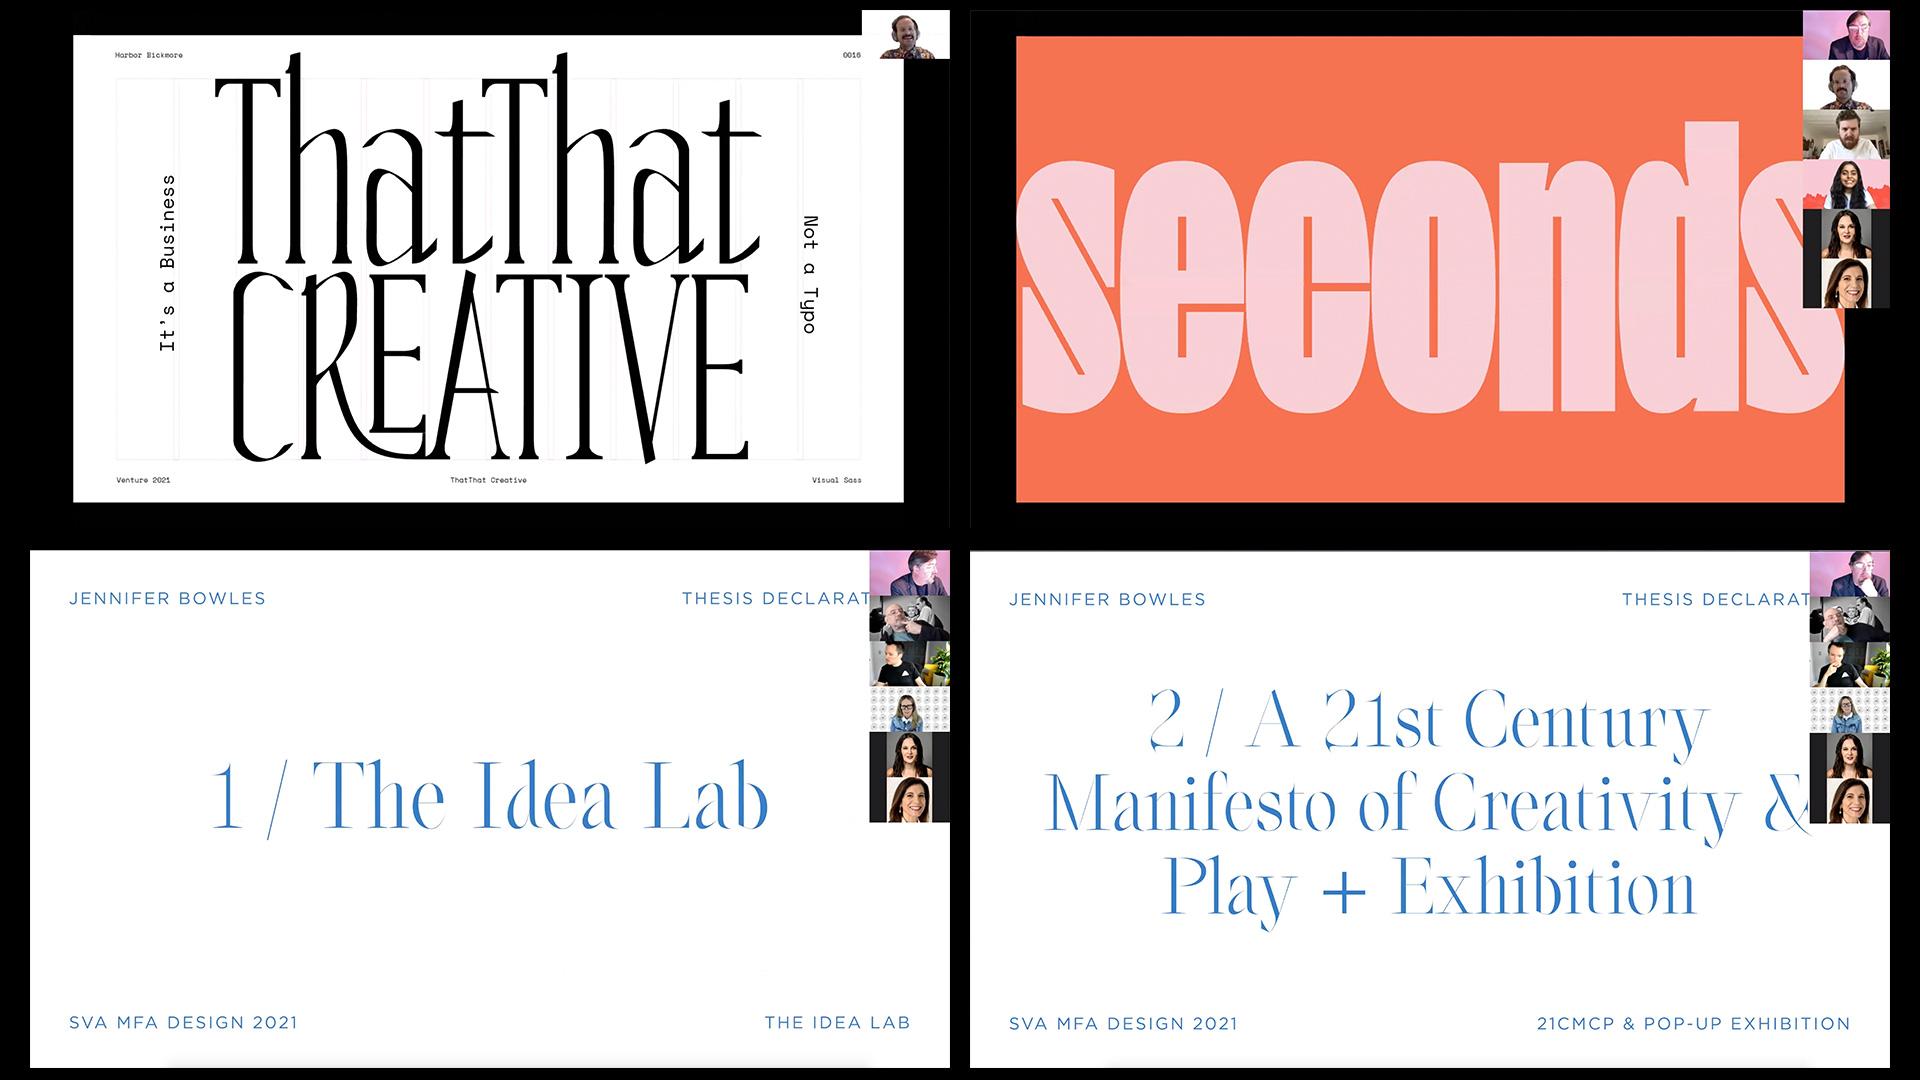 collage of Thesis presentation slides; ThatThat Creative, seconds, Idea Lab, 21st Century Manifesto